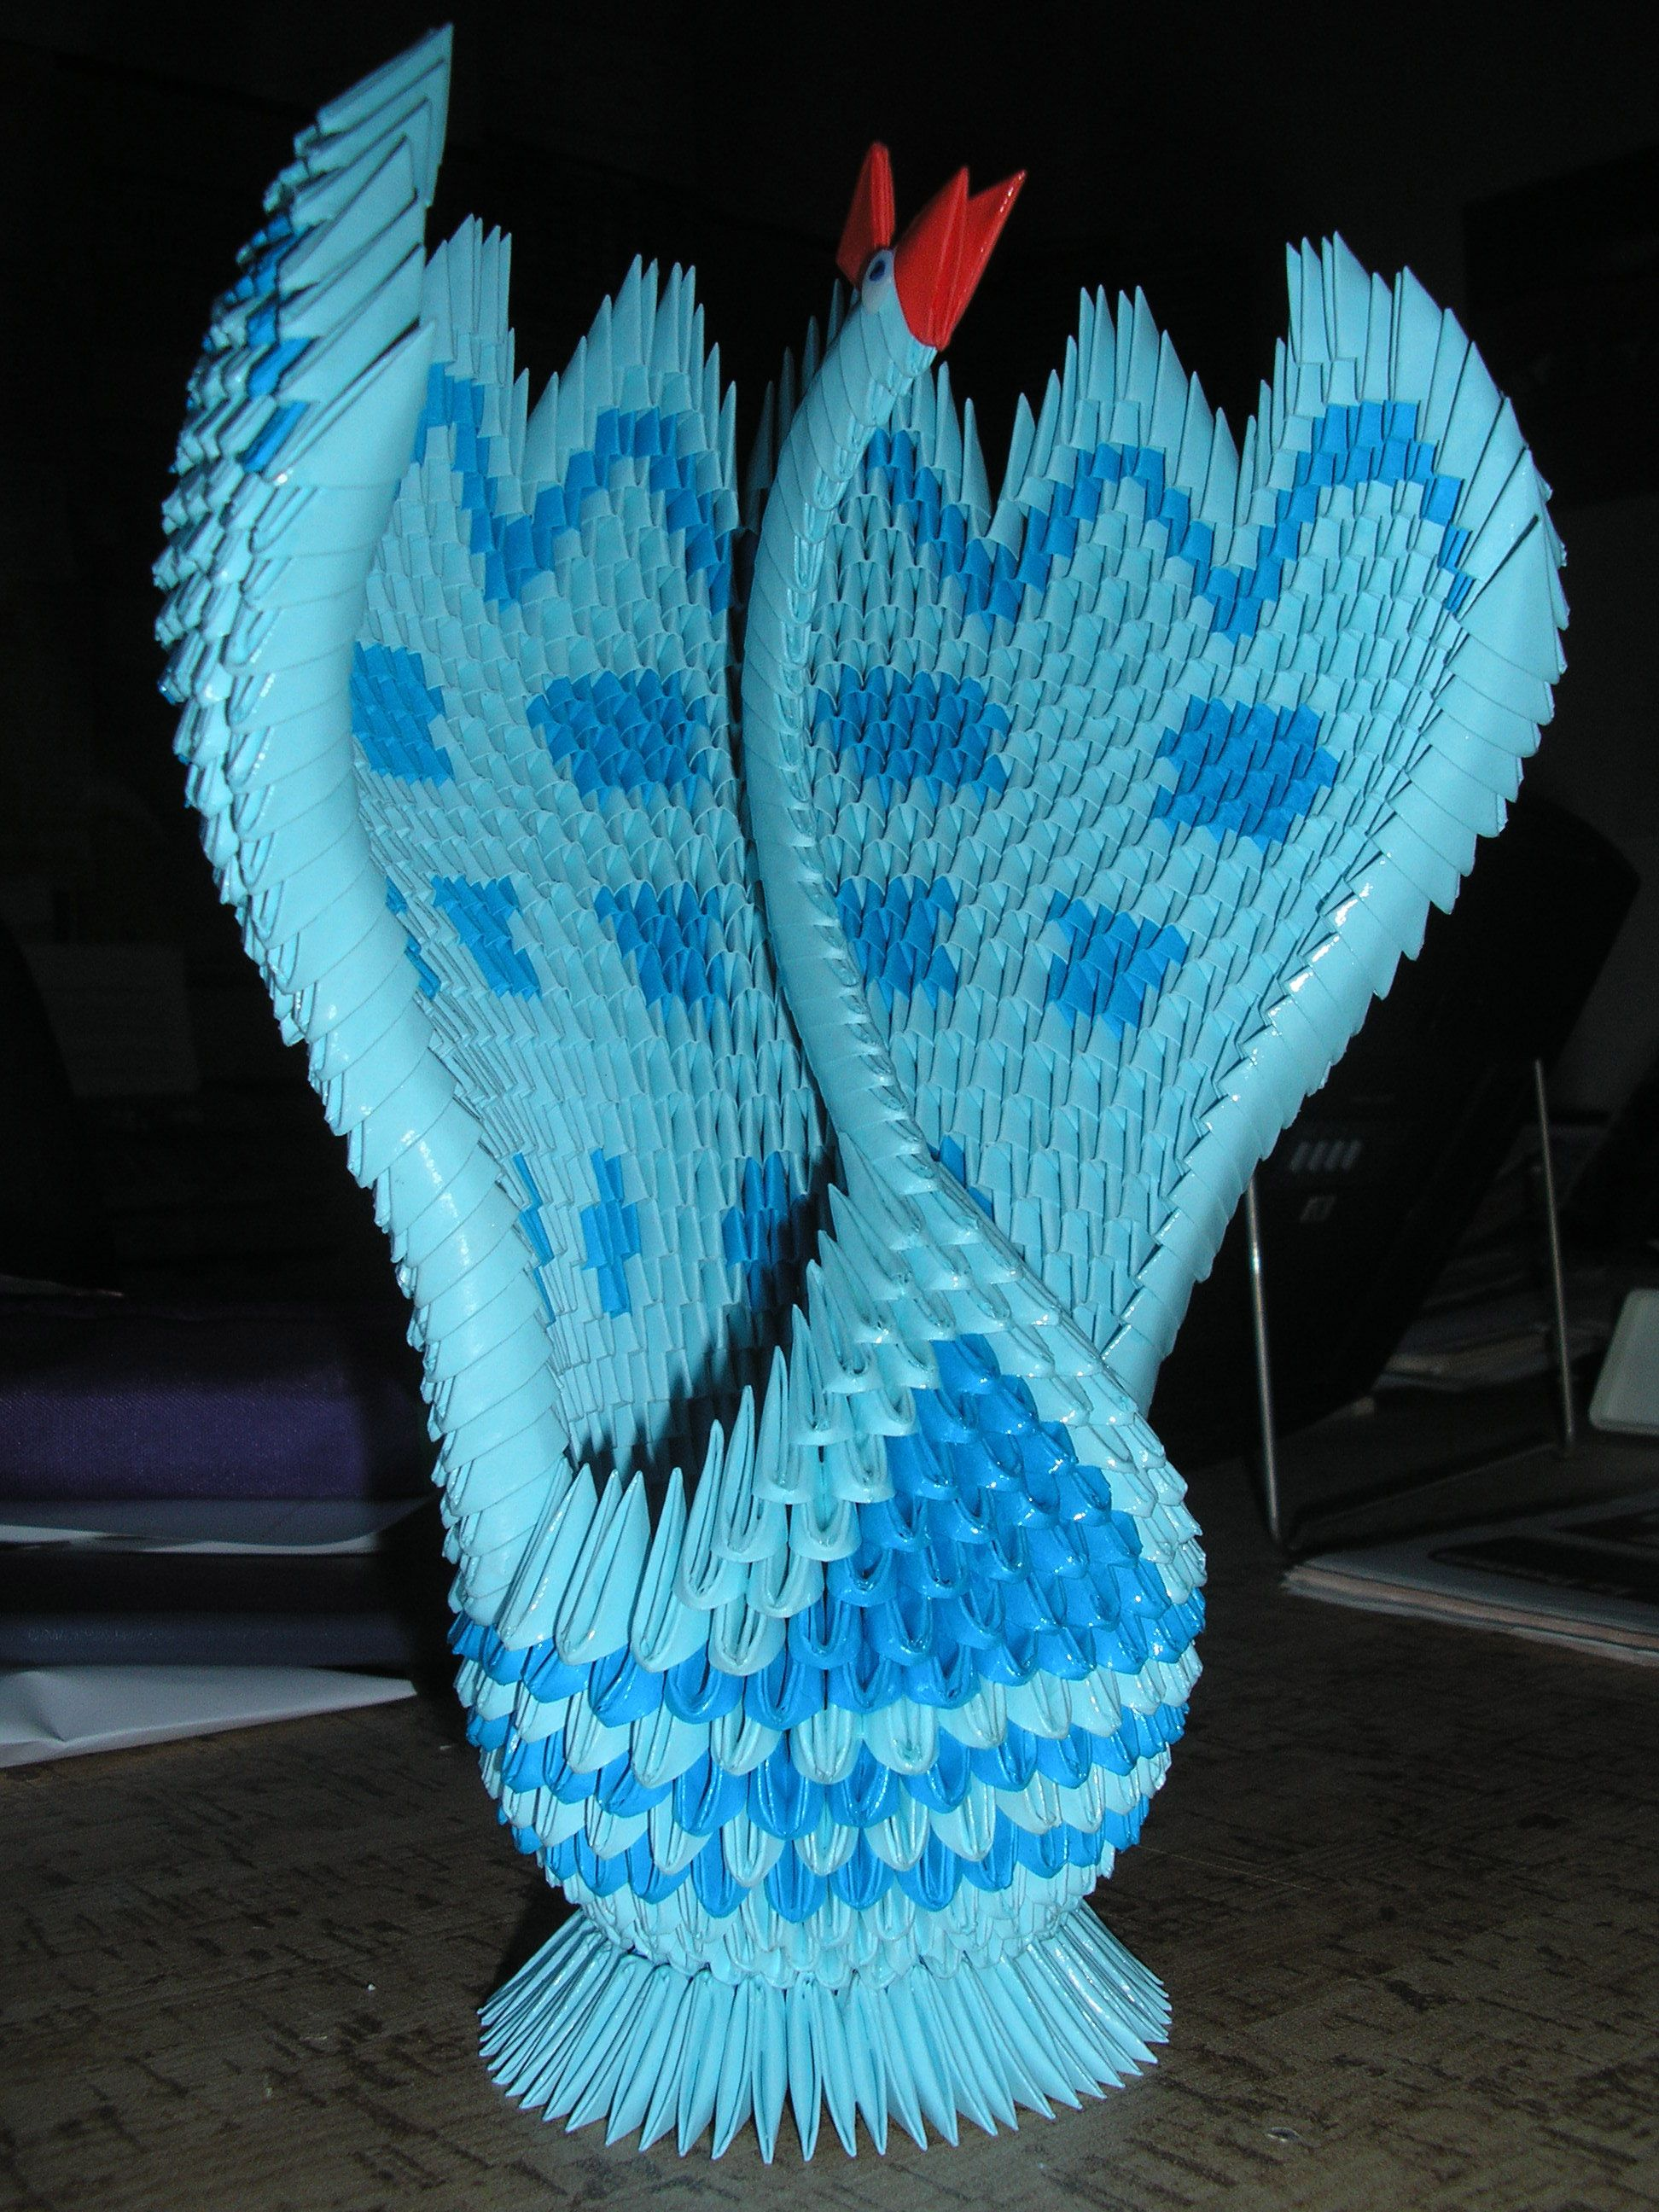 Origami 3D - Peacock | Origami | Pinterest - photo#8